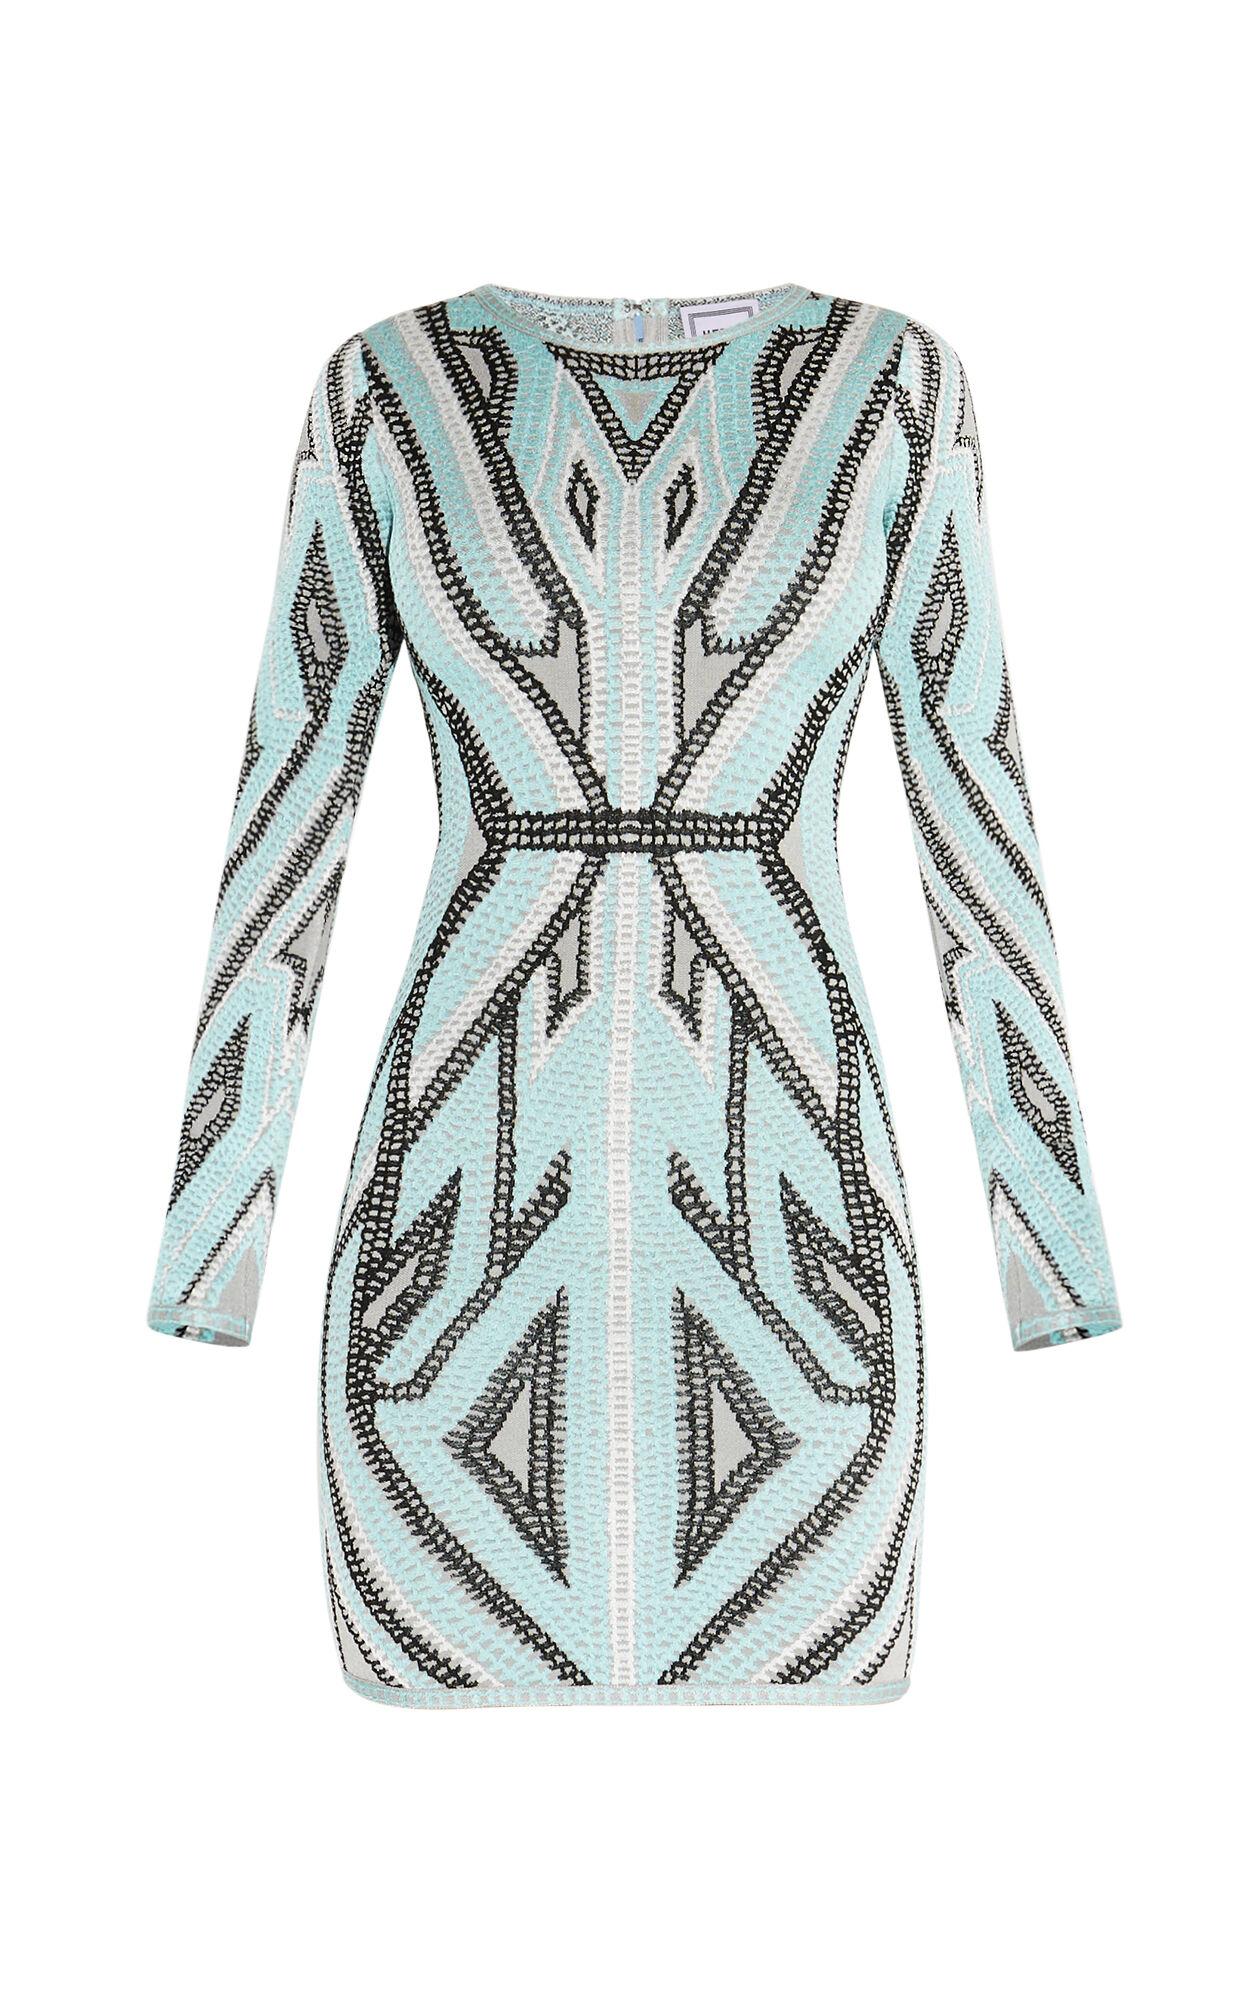 Agne Geometric Jacquard Dress